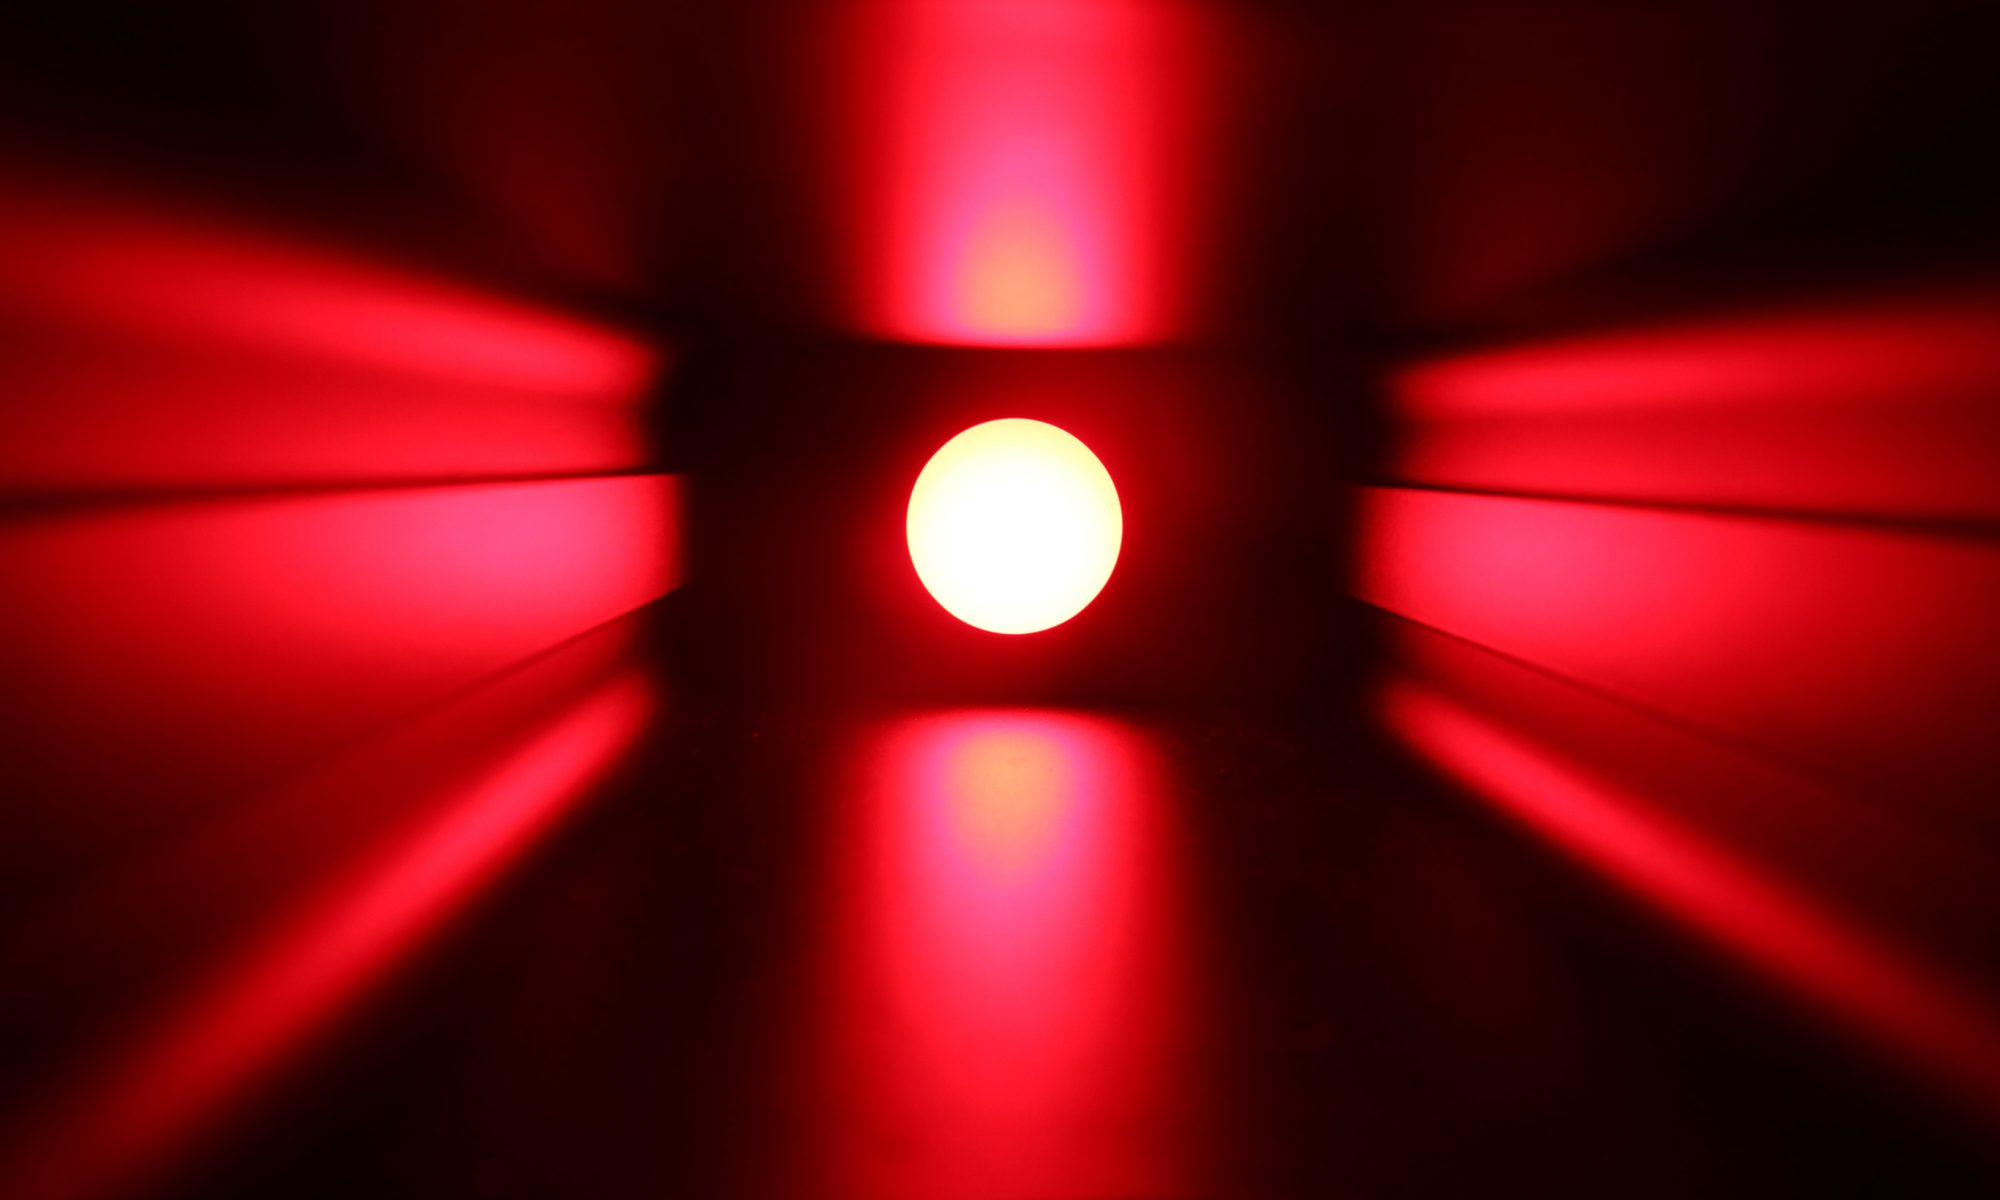 imagen luz roja